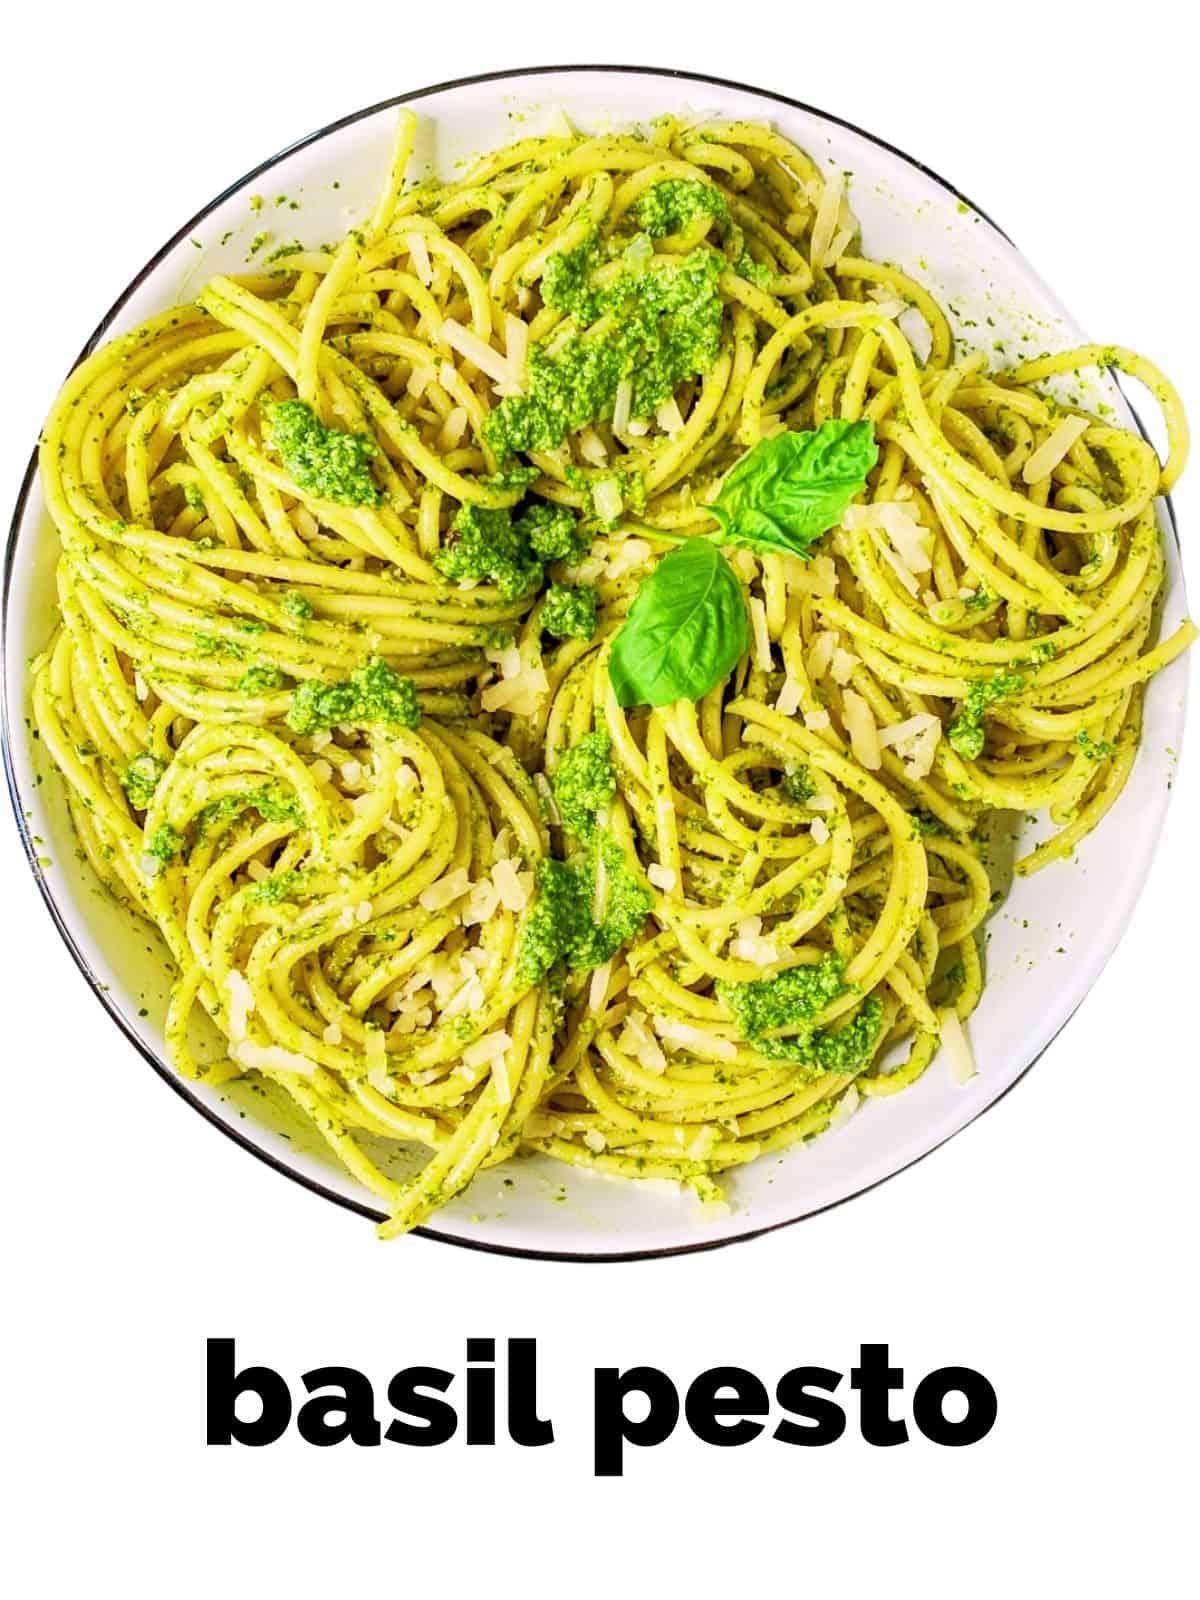 homemade basil pesto in a white dish